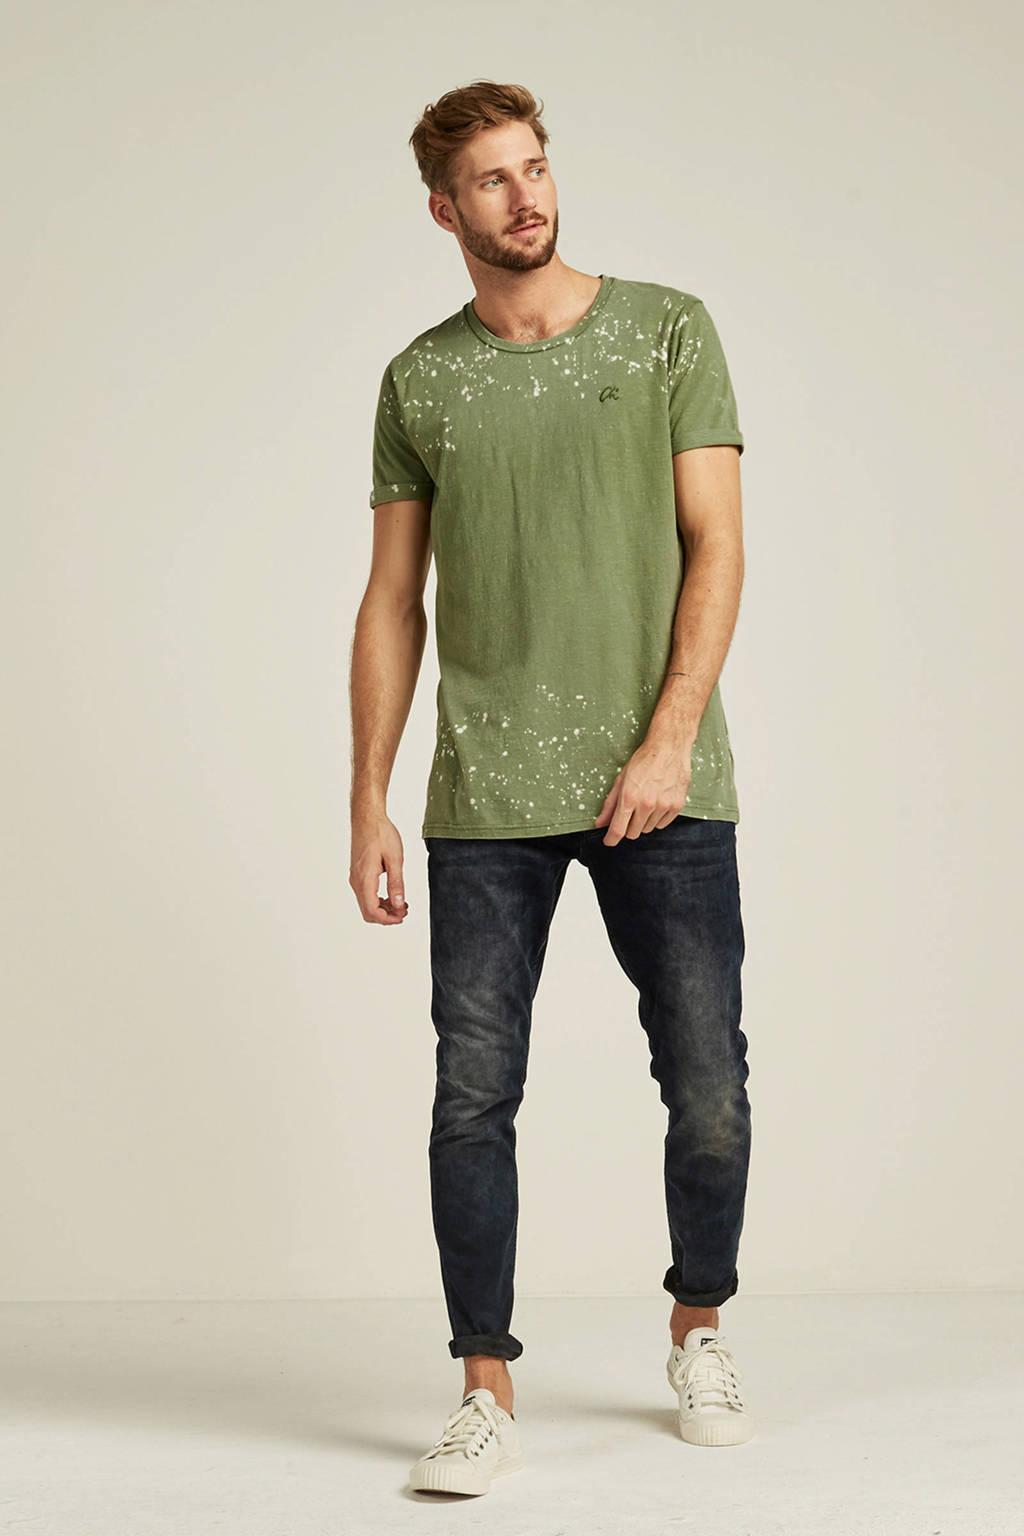 Chasin' slim fit jeans Ego Raven donkerblauw, Donkerblauw